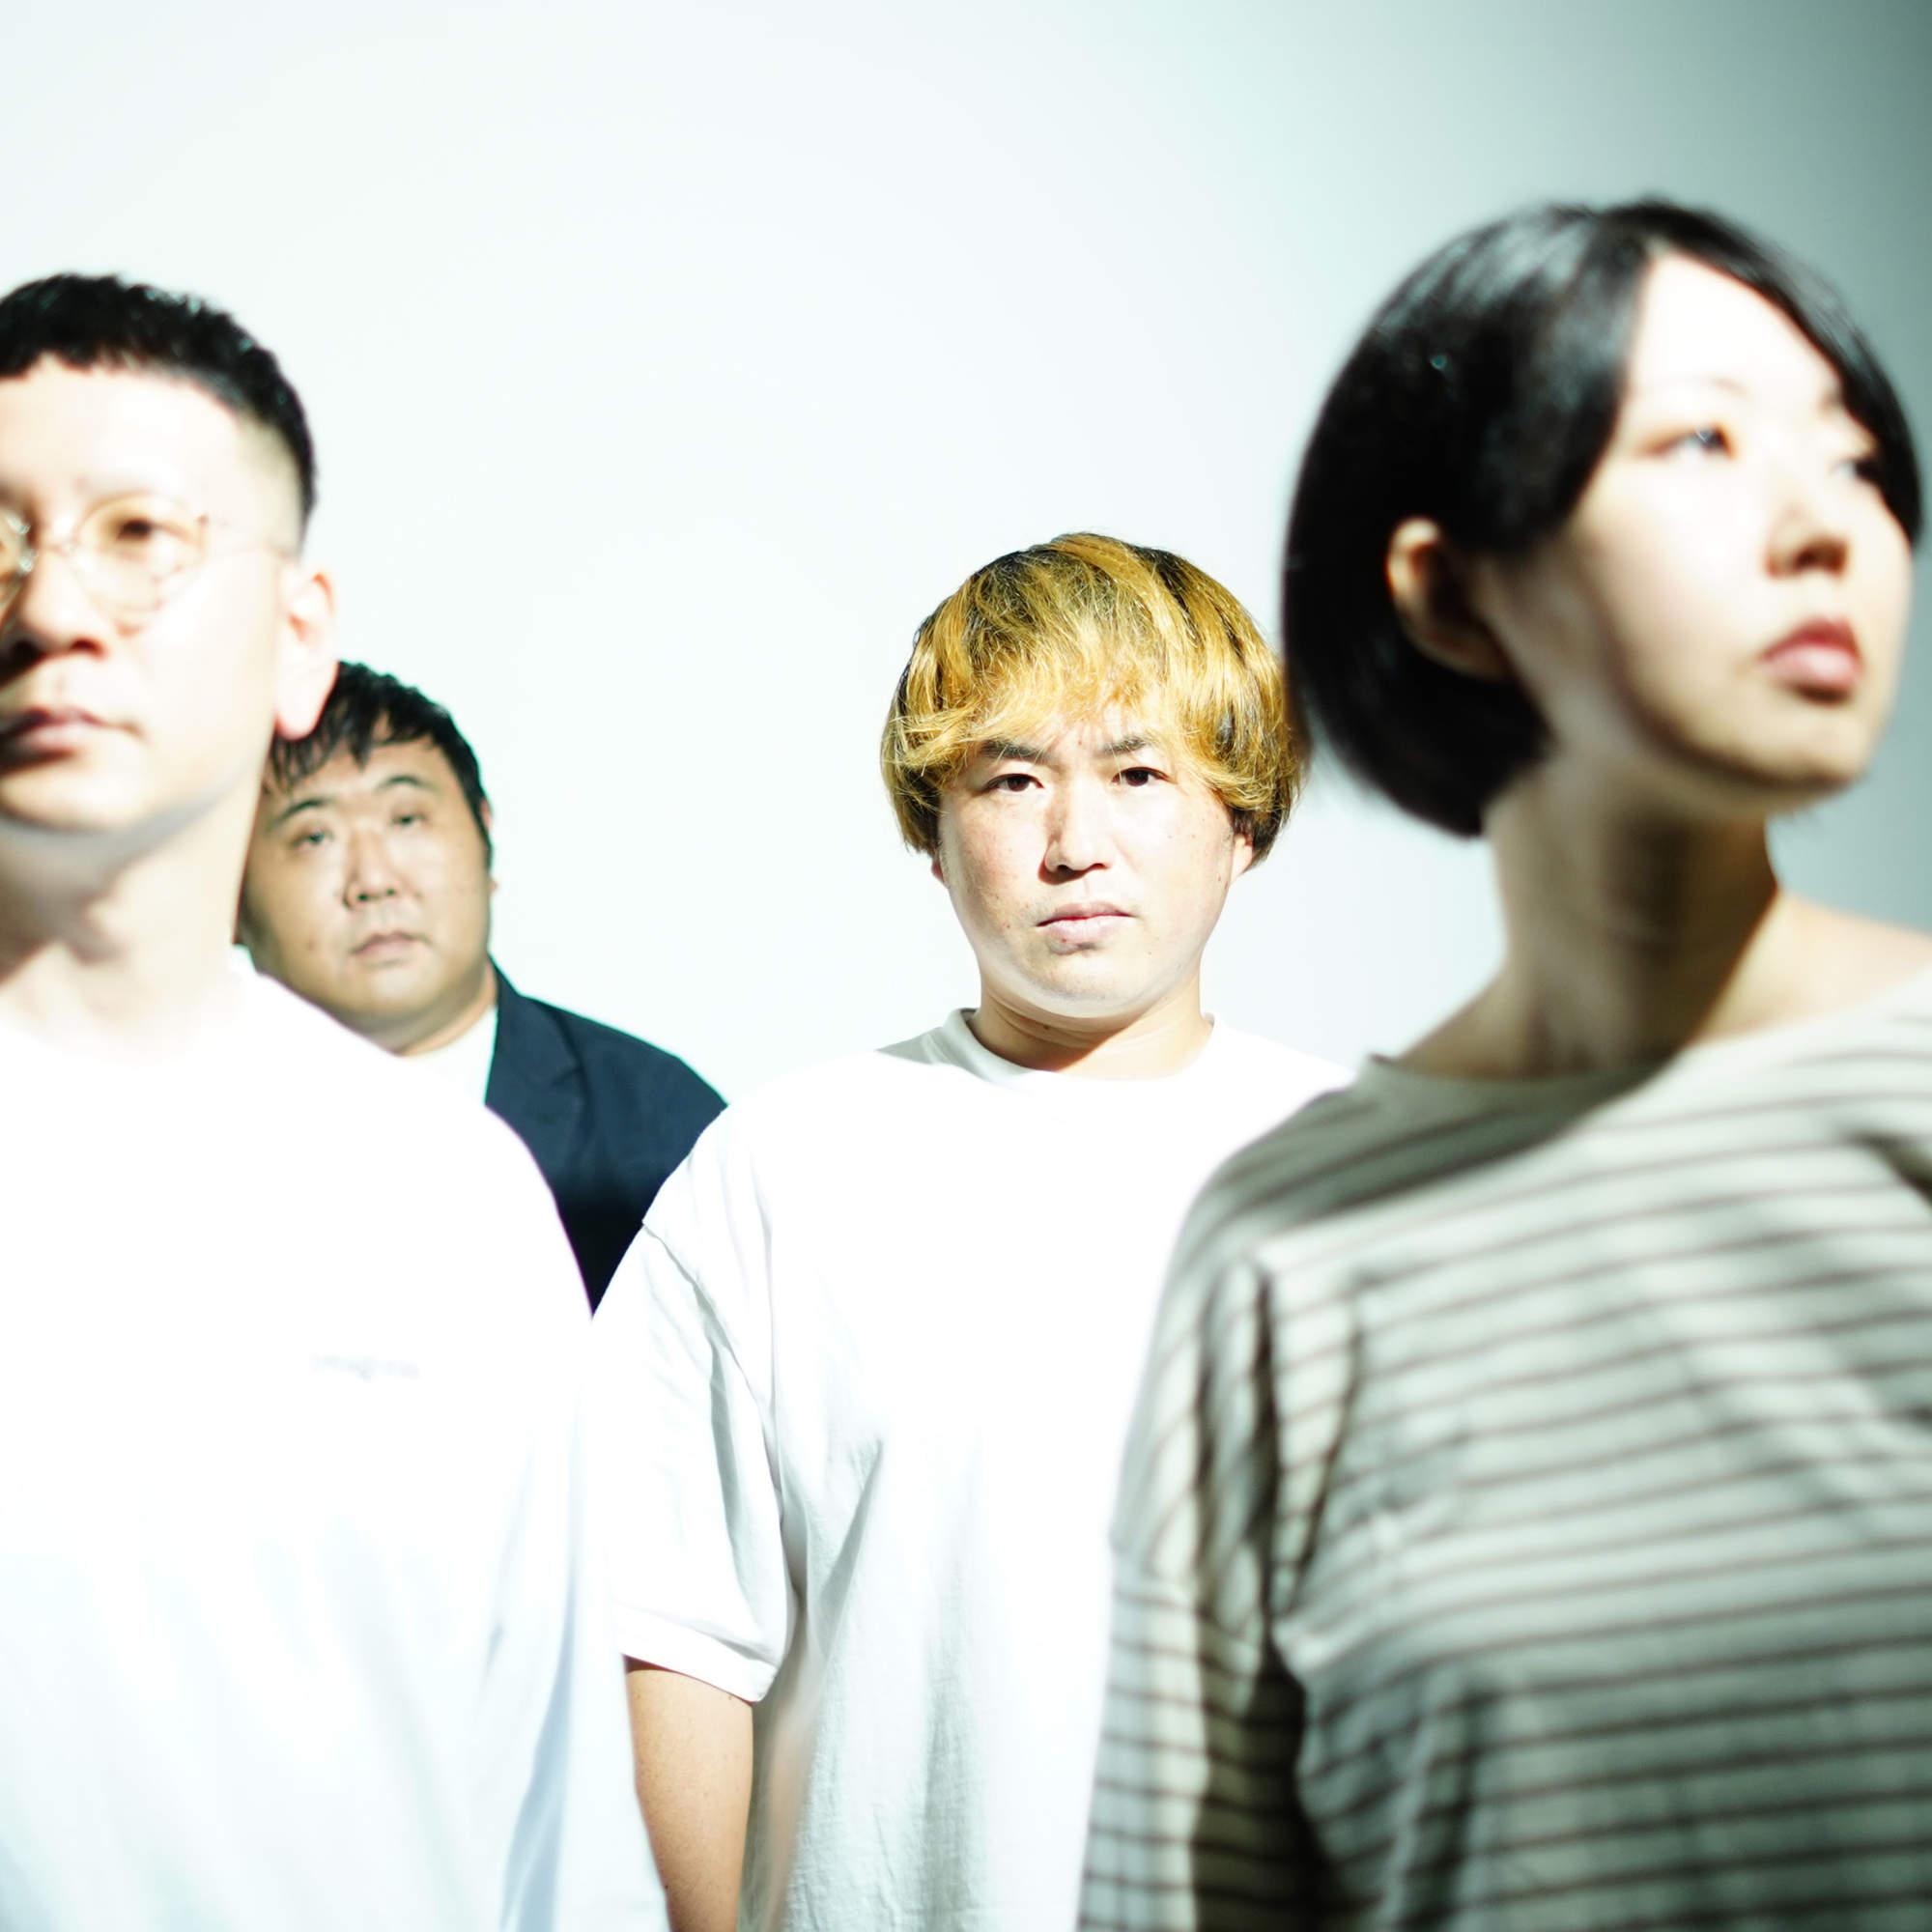 http://rose-records.jp/files/20210907181312.jpg